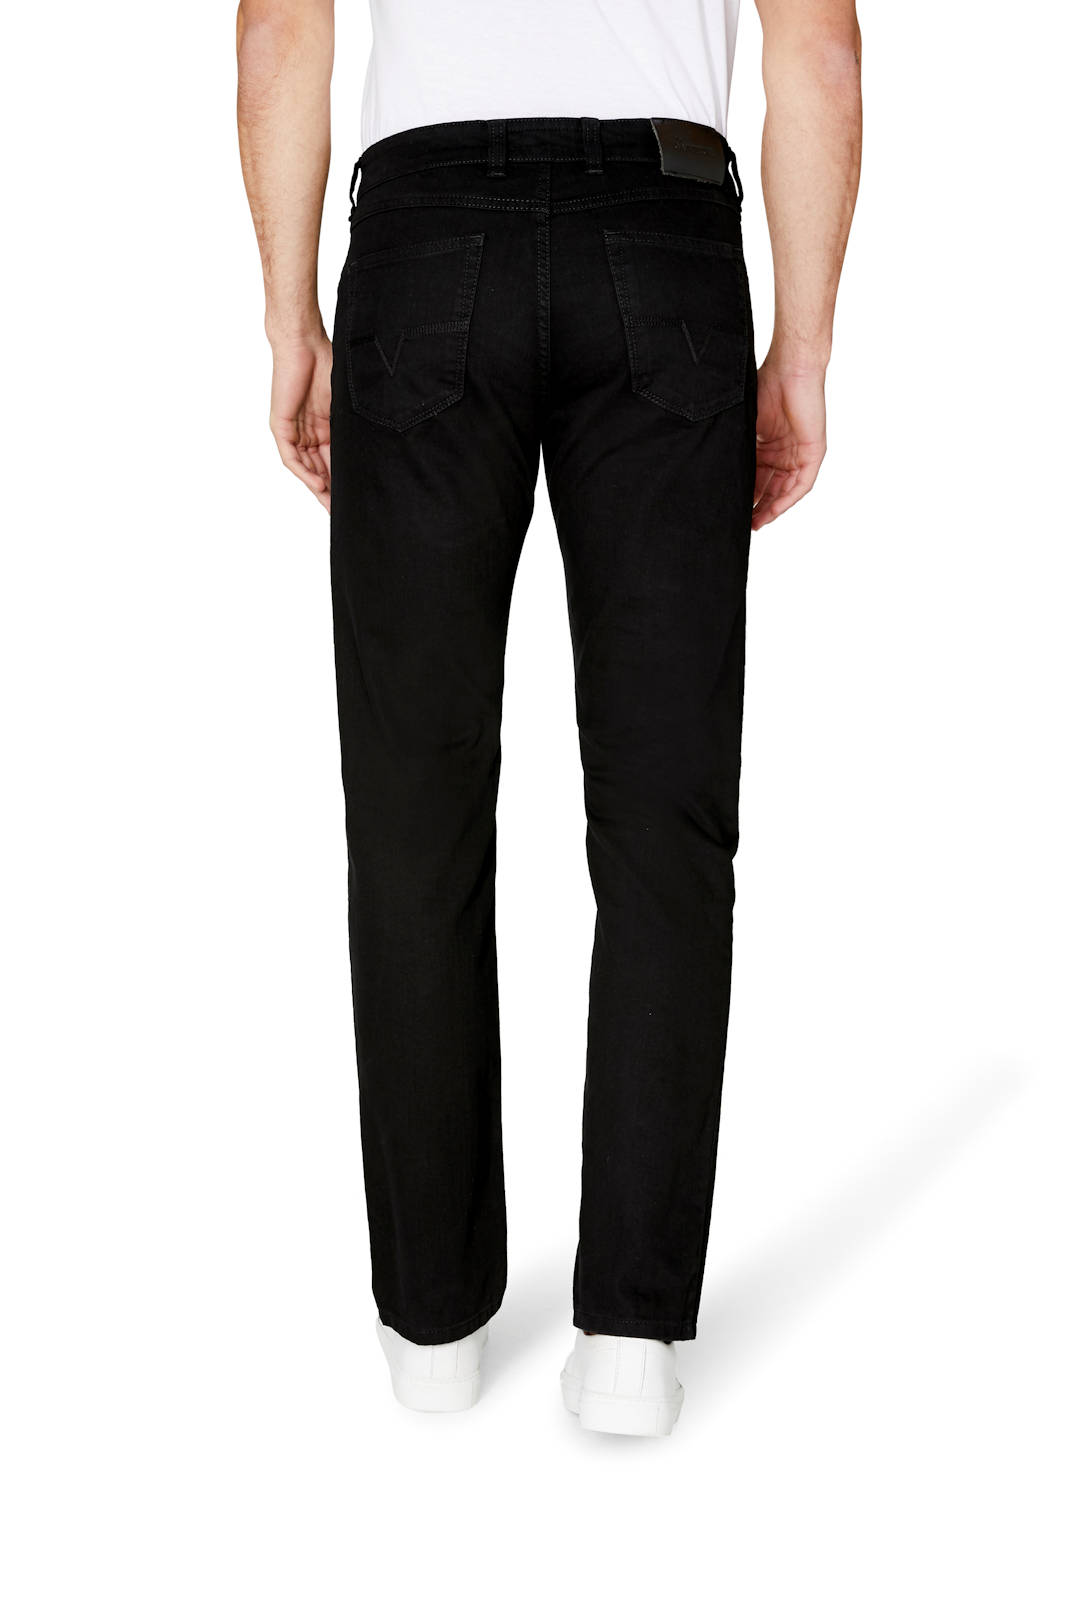 Atelier-GARDEUR-Jeans-NEVIO-11-Regular-Fit-Herren-Hose-Straight-Leg-Denim-NEU Indexbild 16